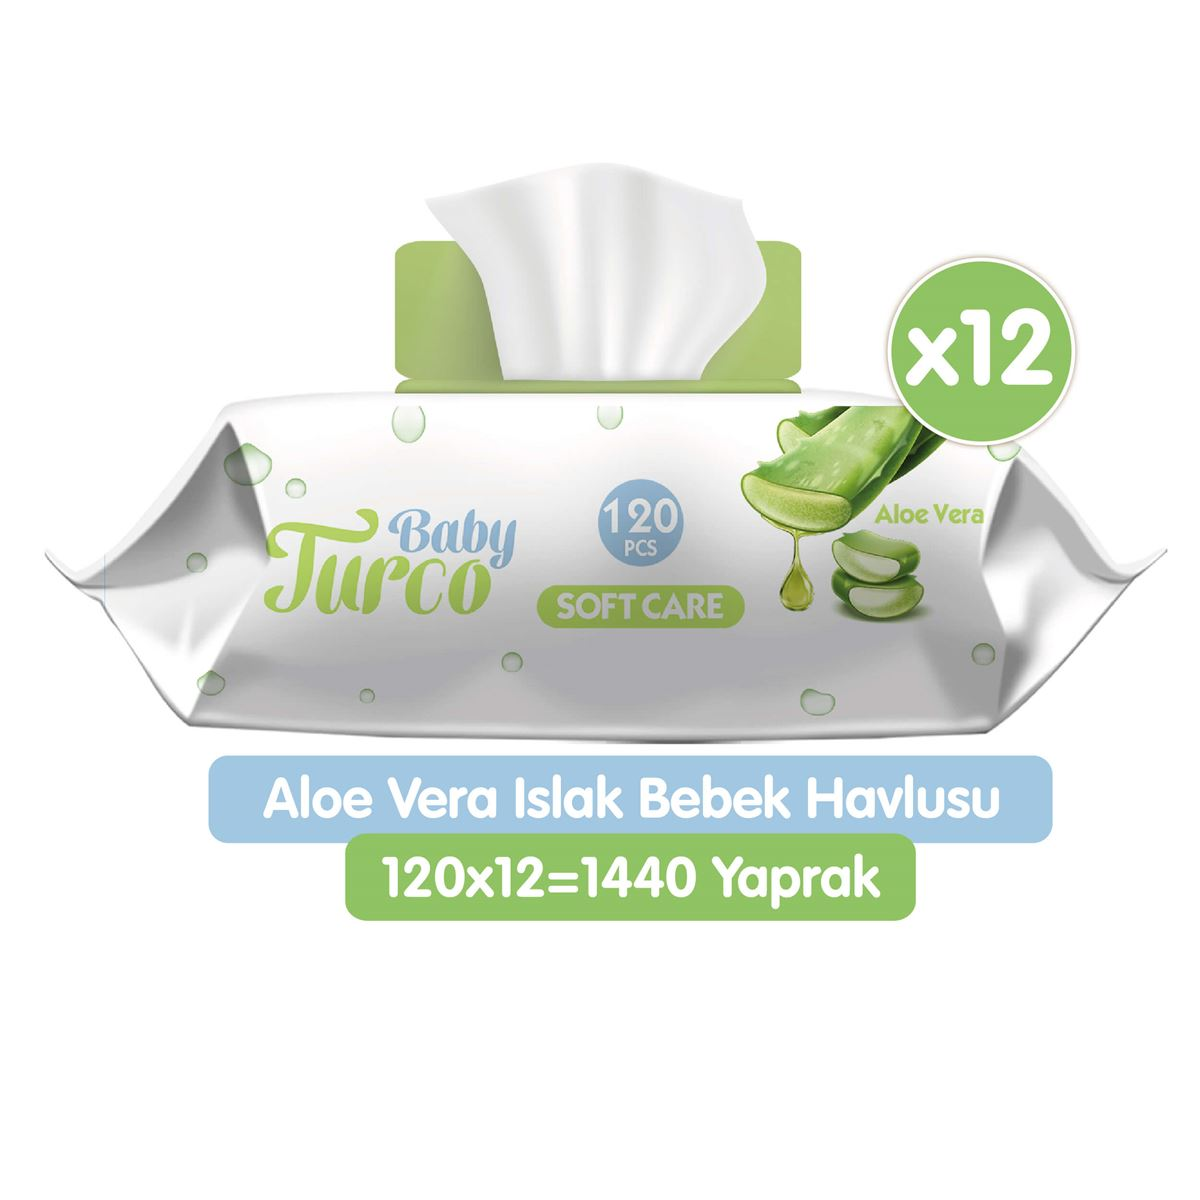 Baby Turco Softcare Aloe Vera Islak Bebek Havlusu 12x120 Adet